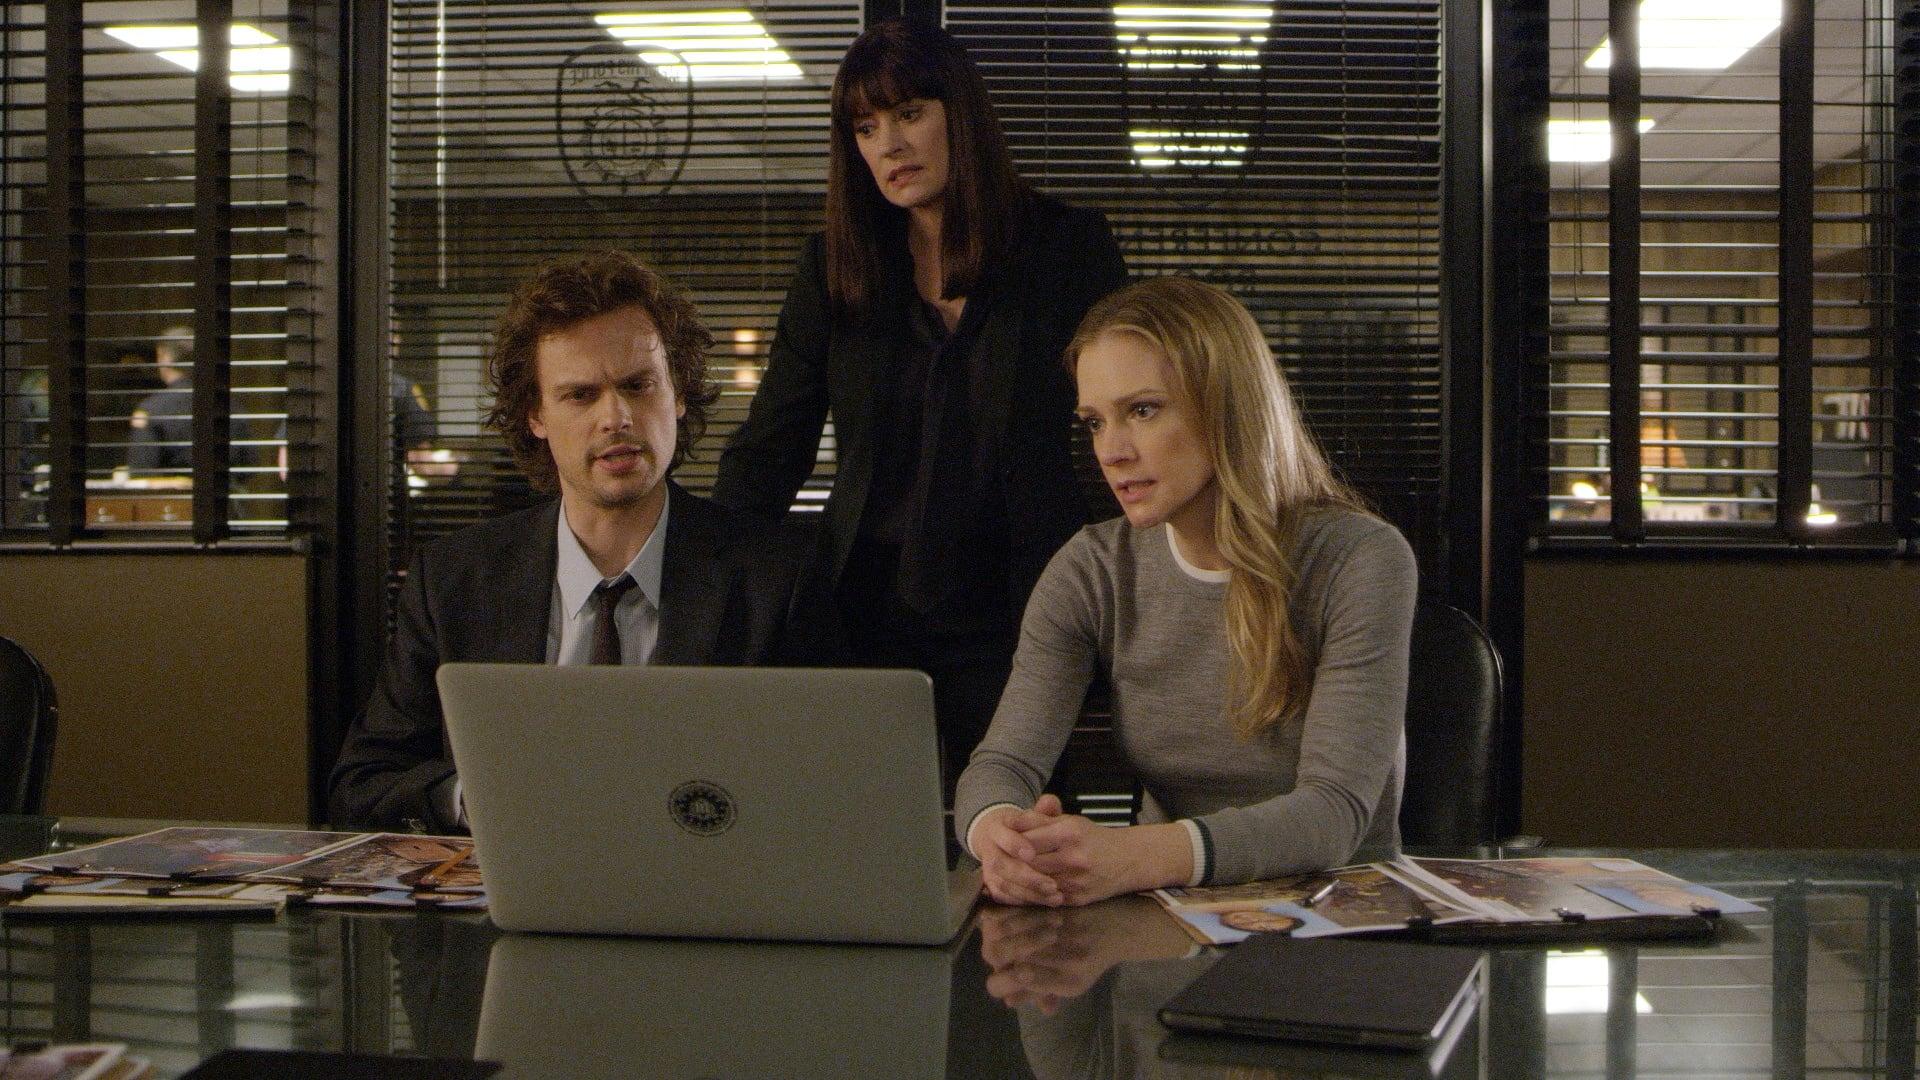 Criminal Minds - Season 15 Episode 3 : Spectator Slowing